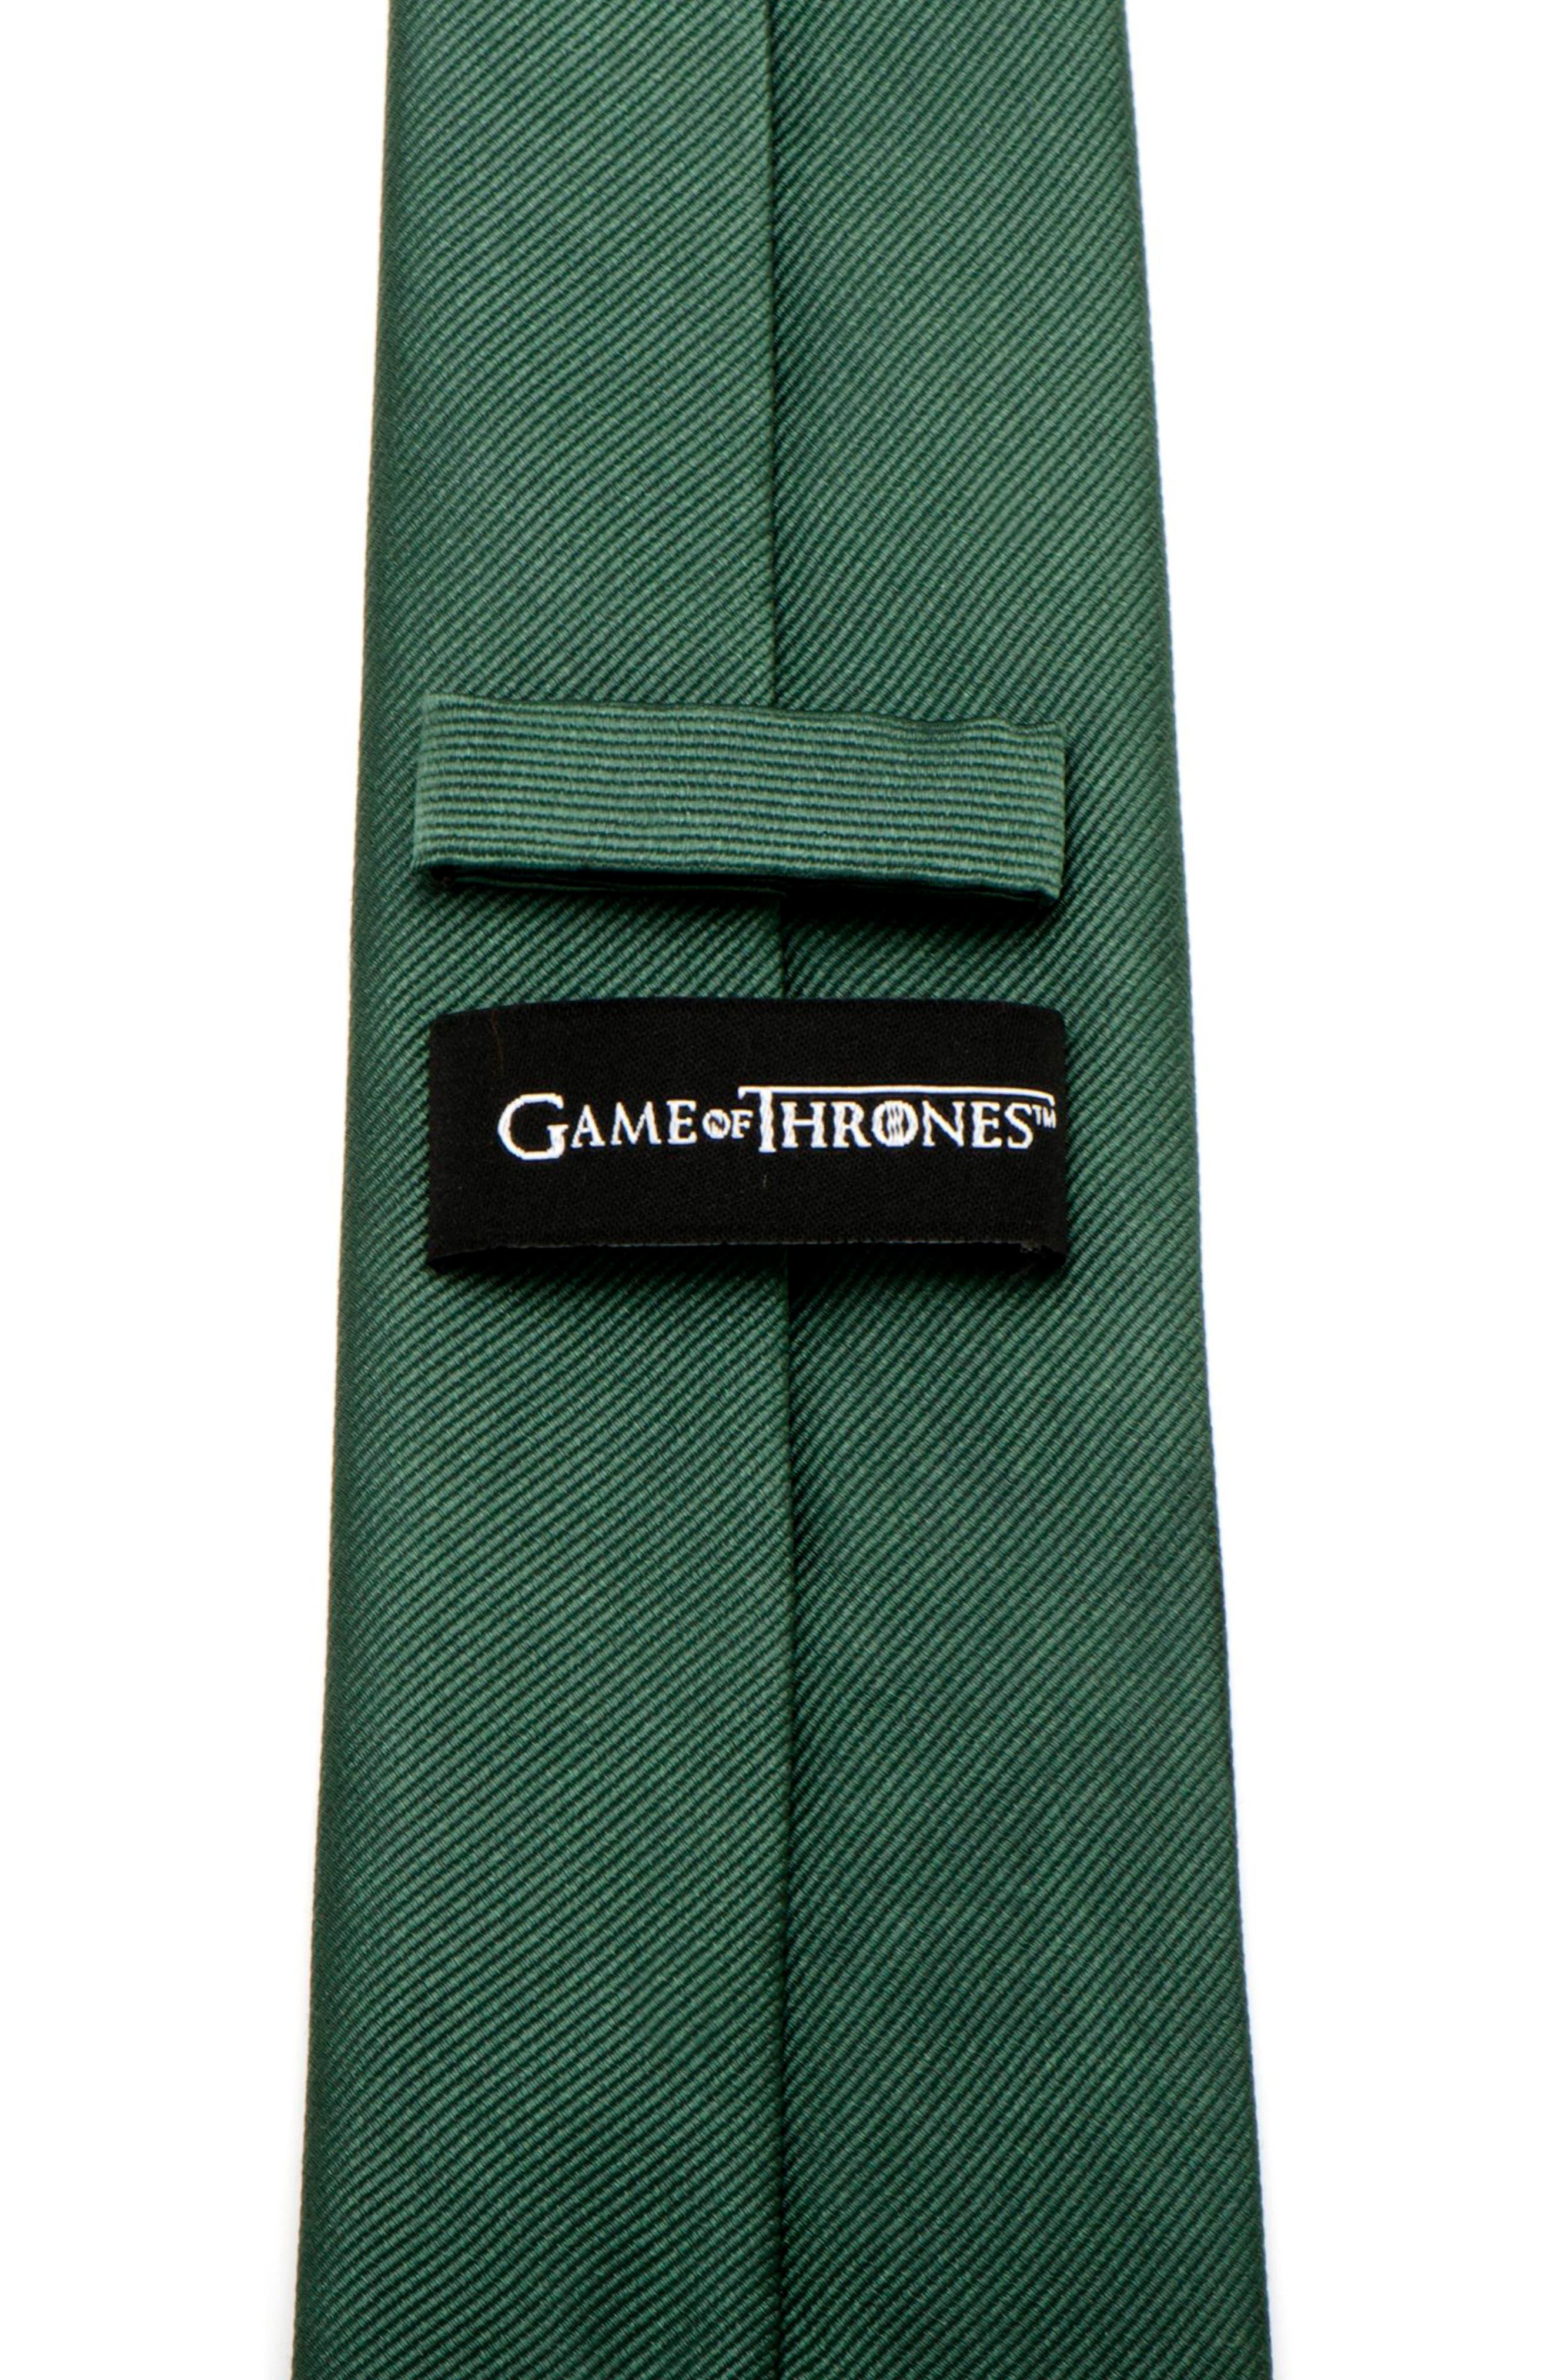 Game of Thrones Stark Silk Tie,                             Alternate thumbnail 4, color,                             GREEN